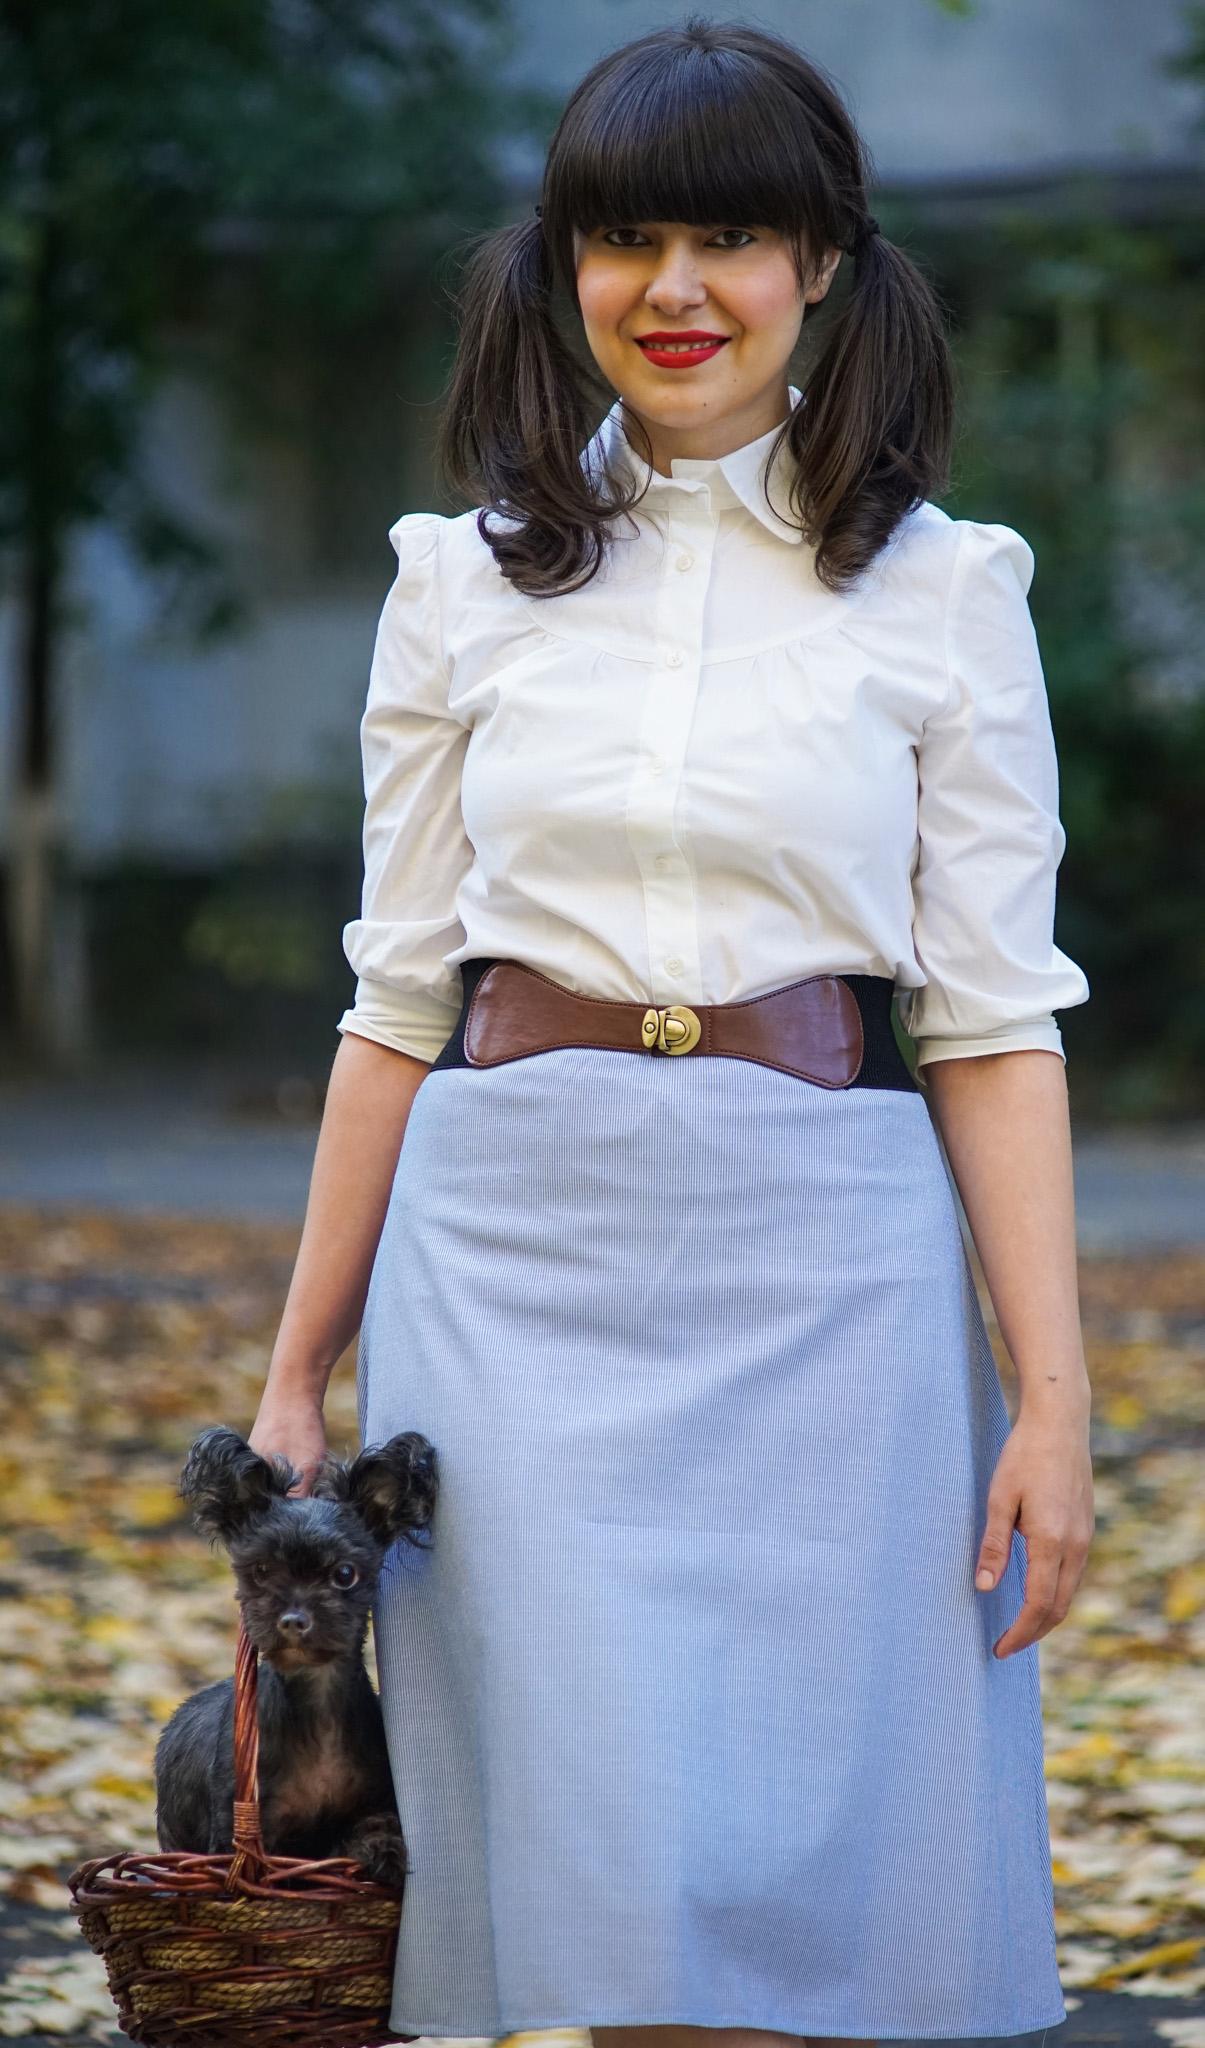 easy DIY Halloween costume dorothy white shirt blue skirt basket dog doggy stuffed toy stuffed bear  sc 1 st  Miss Green & Miss Green: Easy DIY Halloween Costume - Dorothy